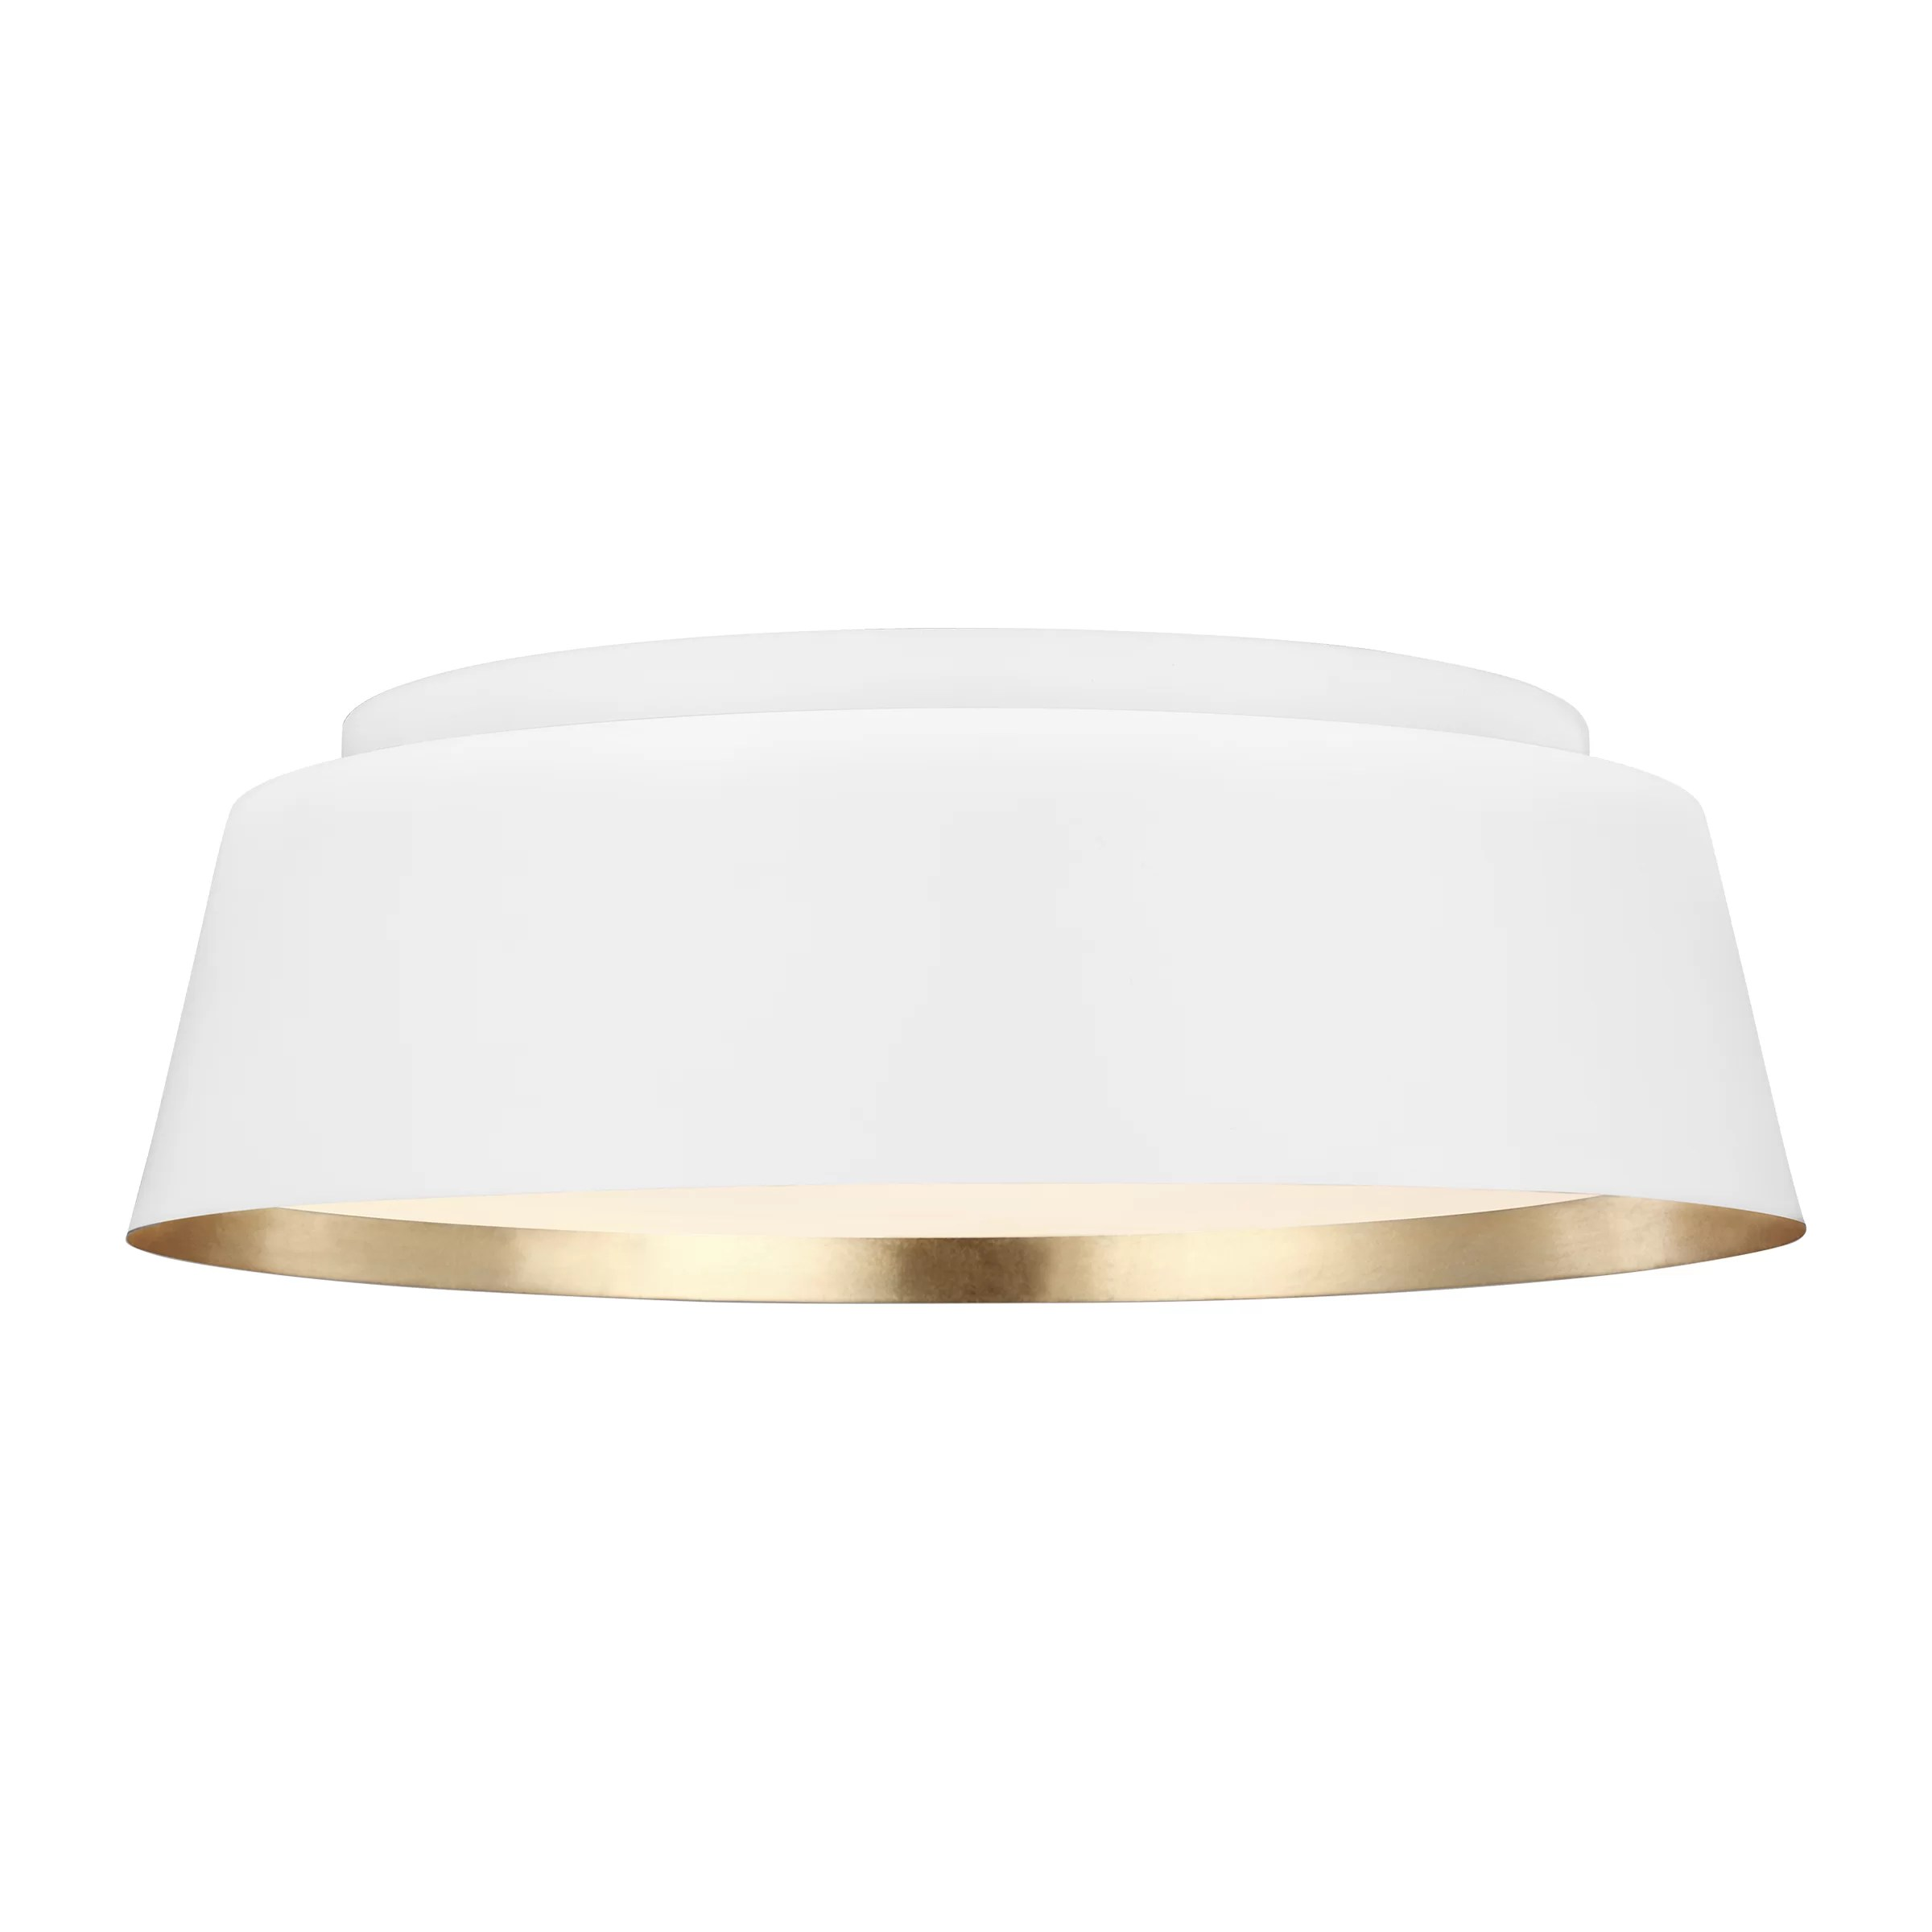 asher 3 light 14 5 simple drum flush mount